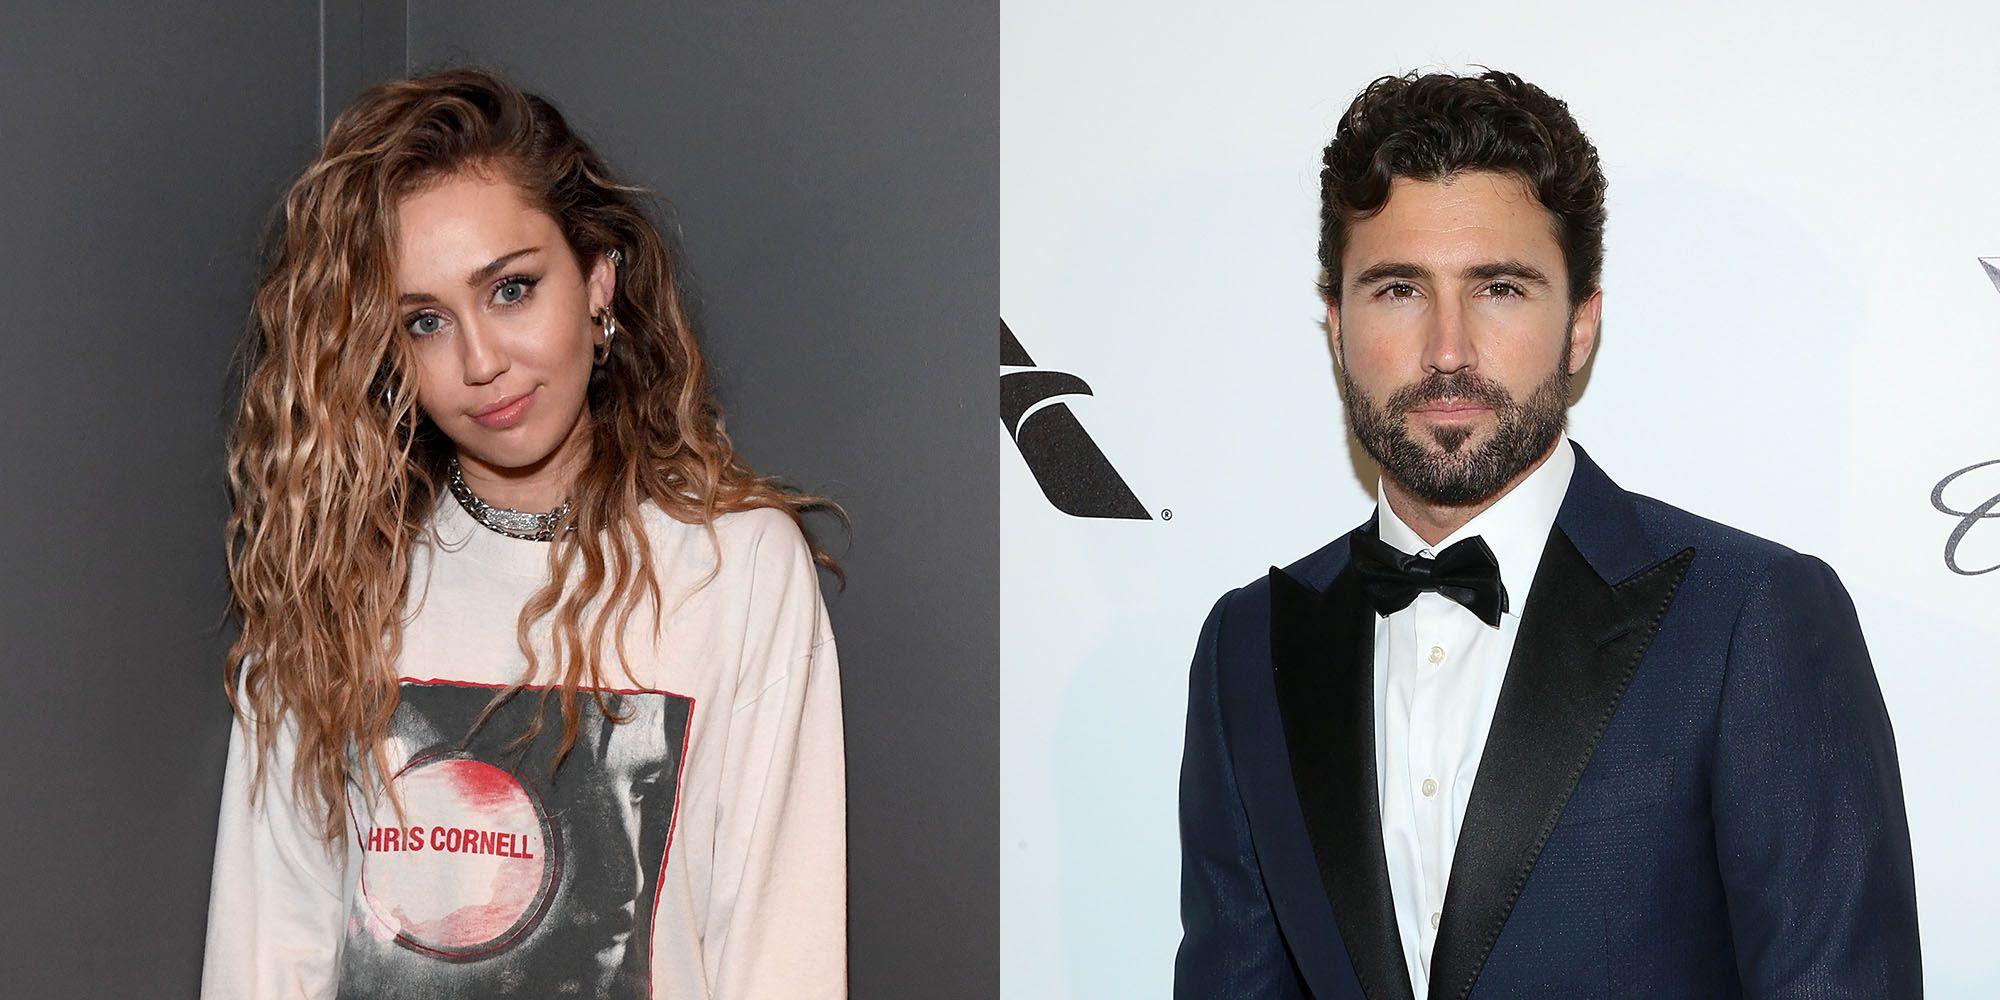 Miley Cyrus and Kaitlynn Carter sent Brody Jenner an unusual birthday present